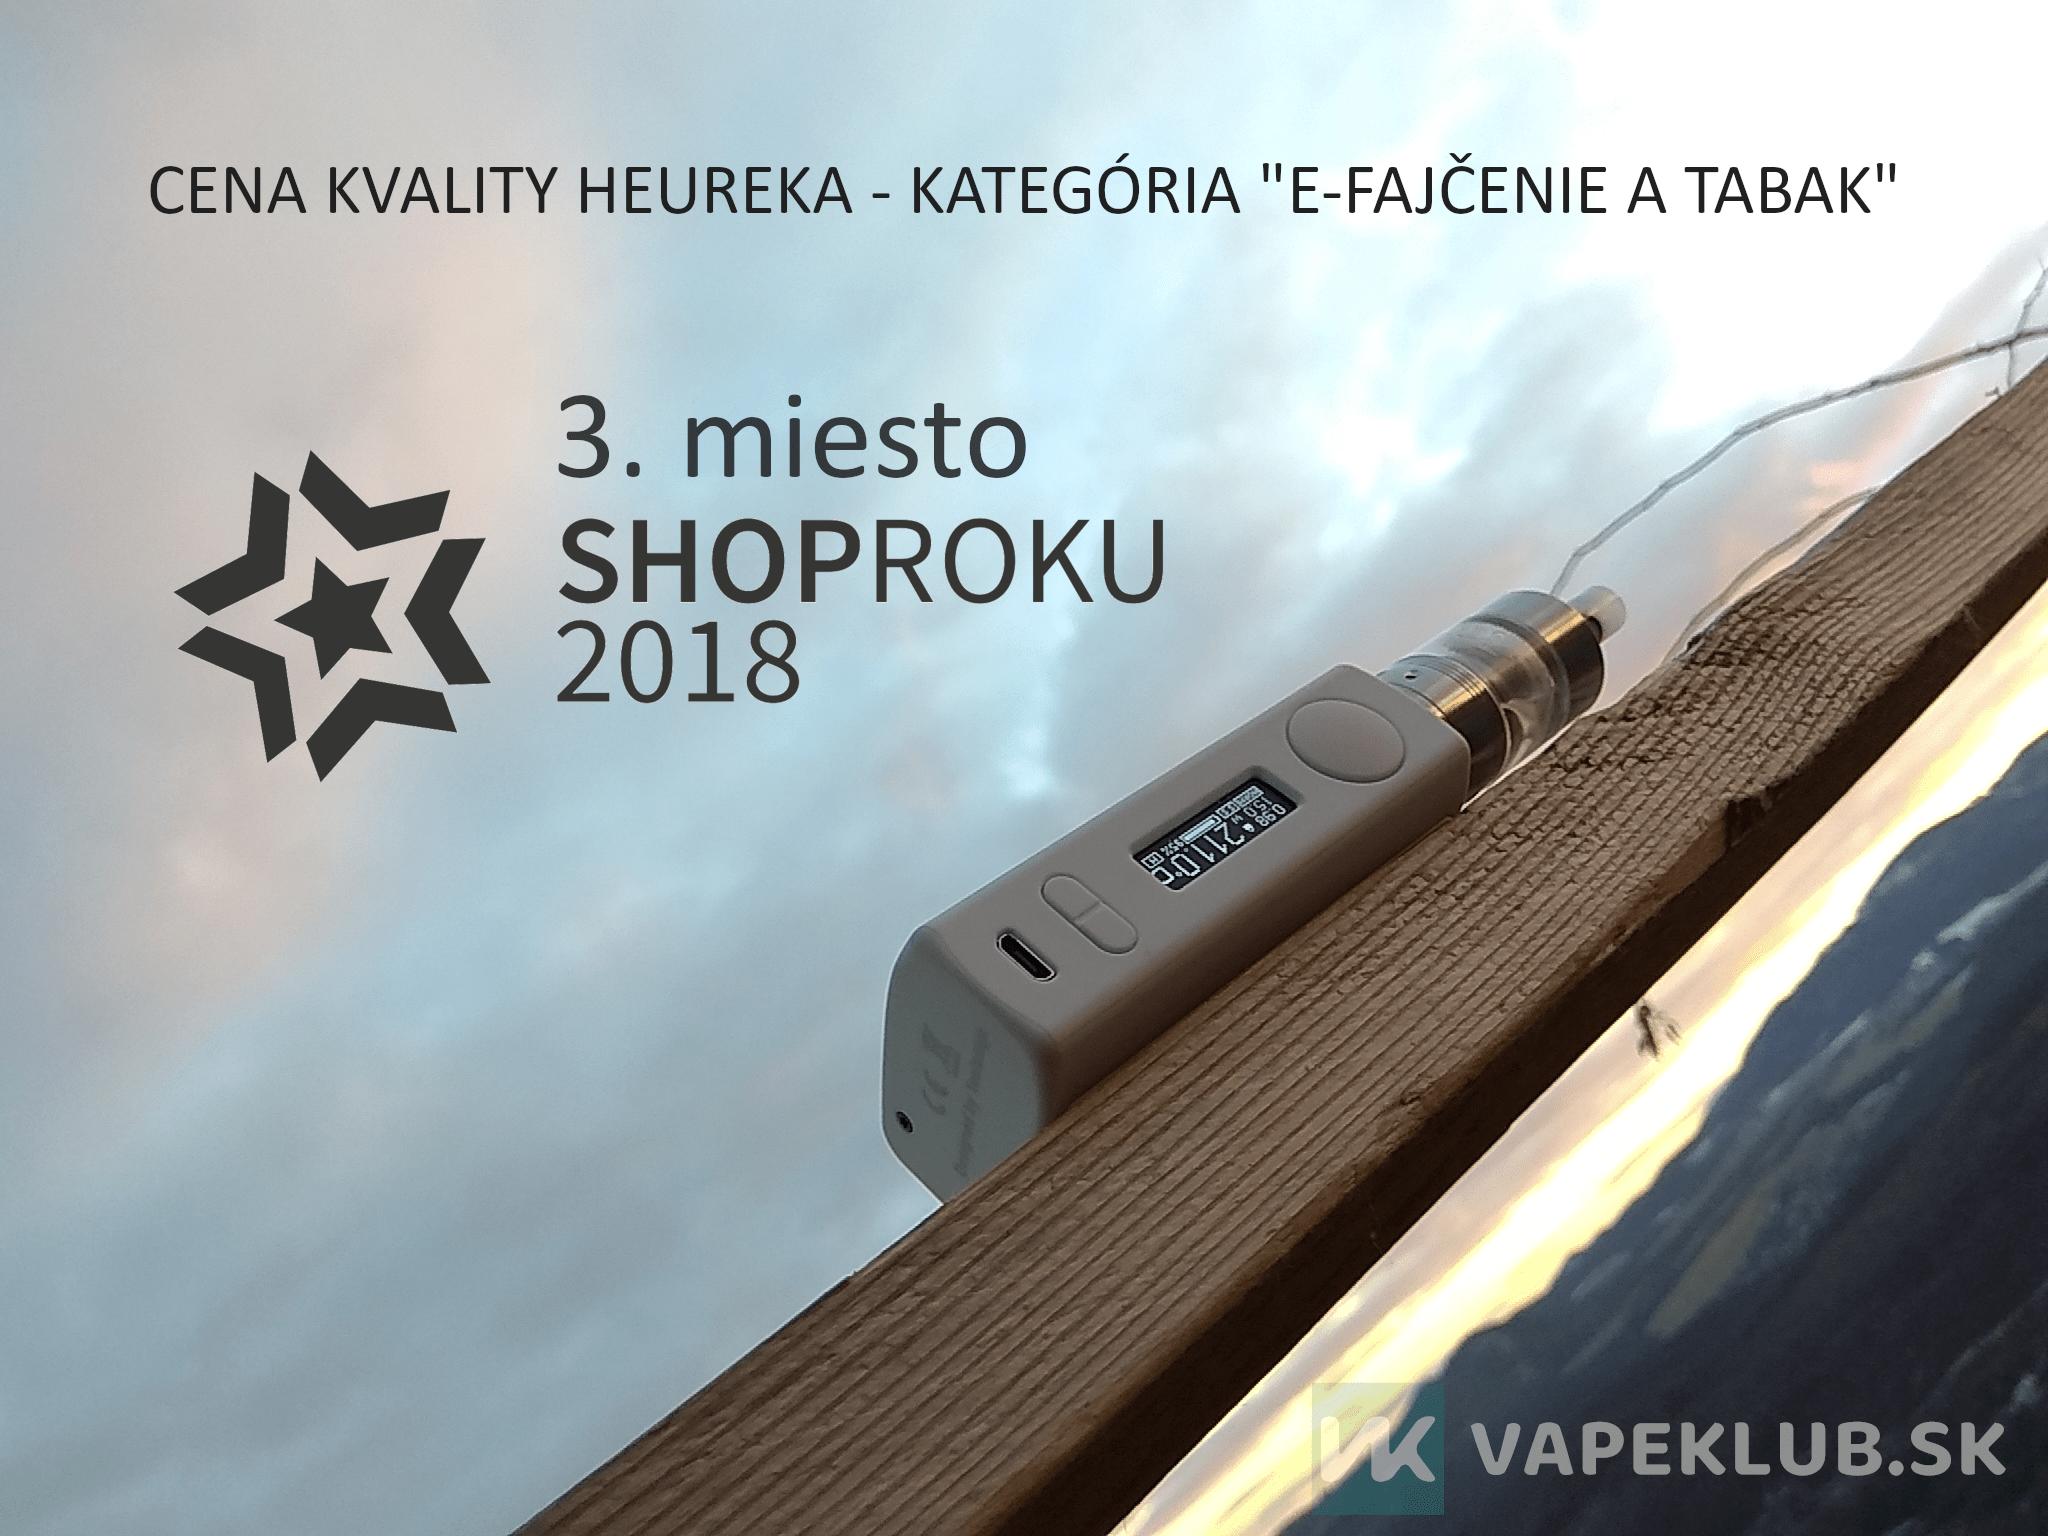 shop-roku-vapeklub-siroke-2